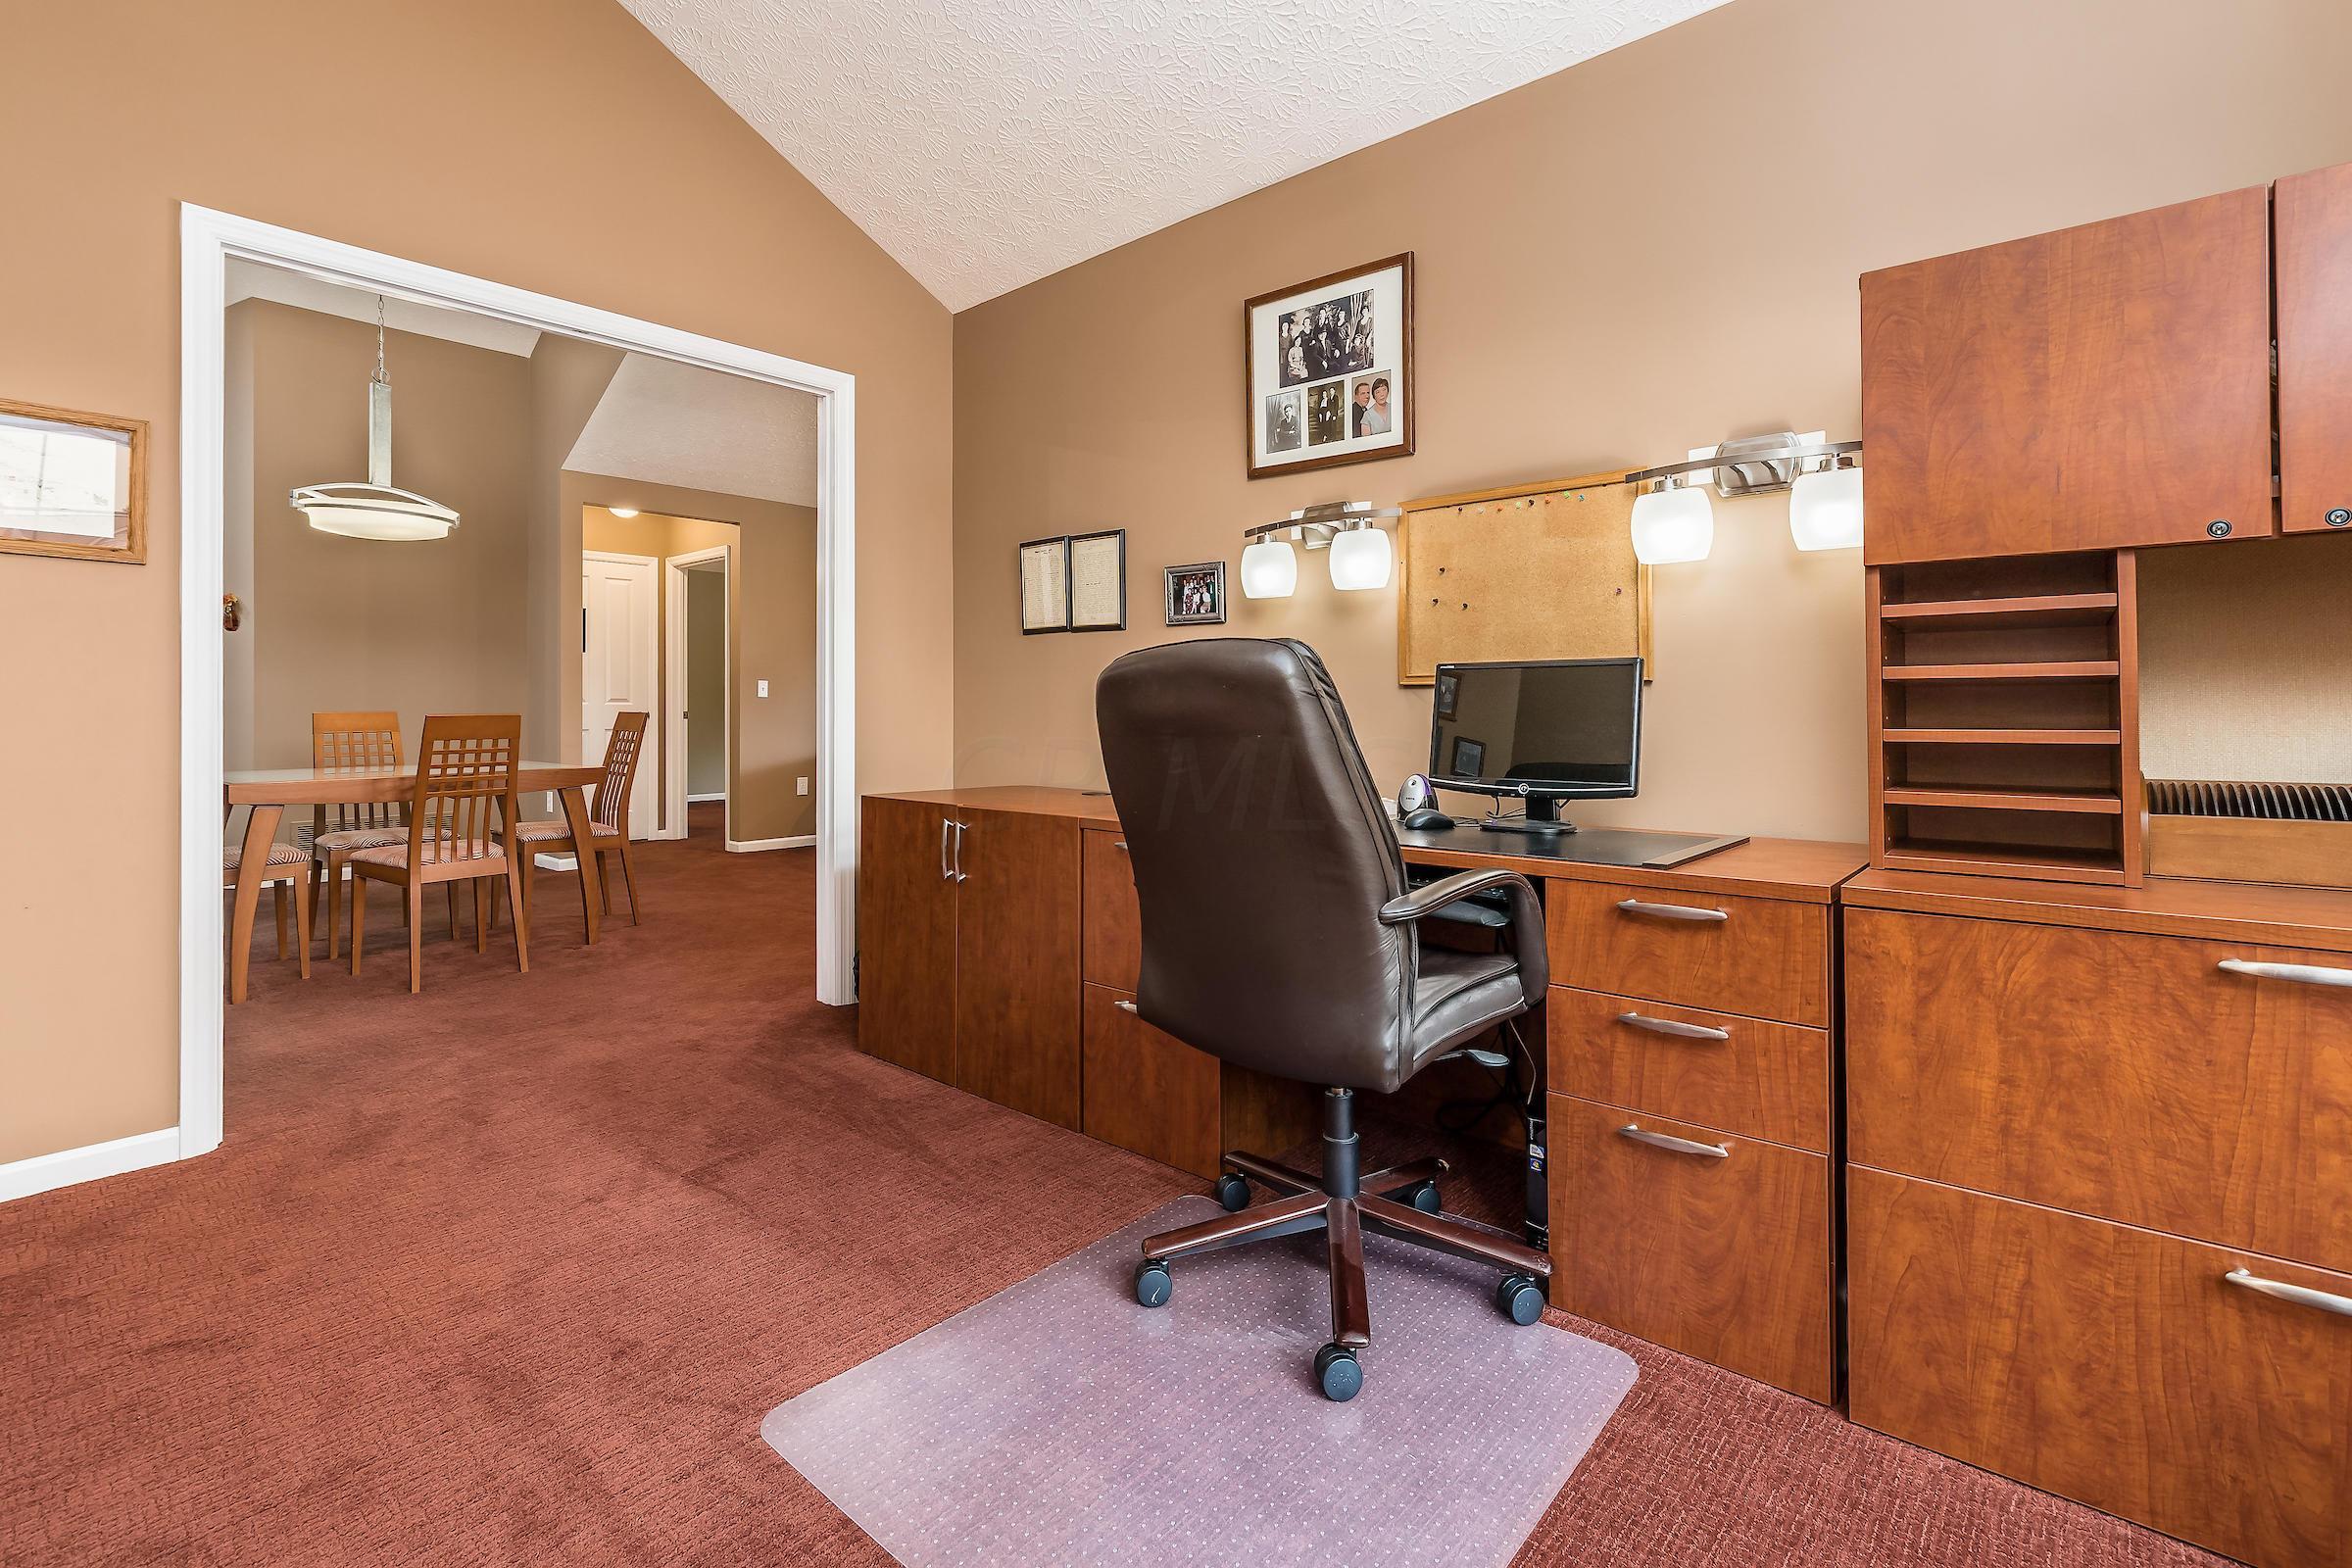 6254 BRICKSIDE Drive, New Albany, Ohio 43054, 2 Bedrooms Bedrooms, ,2 BathroomsBathrooms,Residential,For Sale,BRICKSIDE,220025817